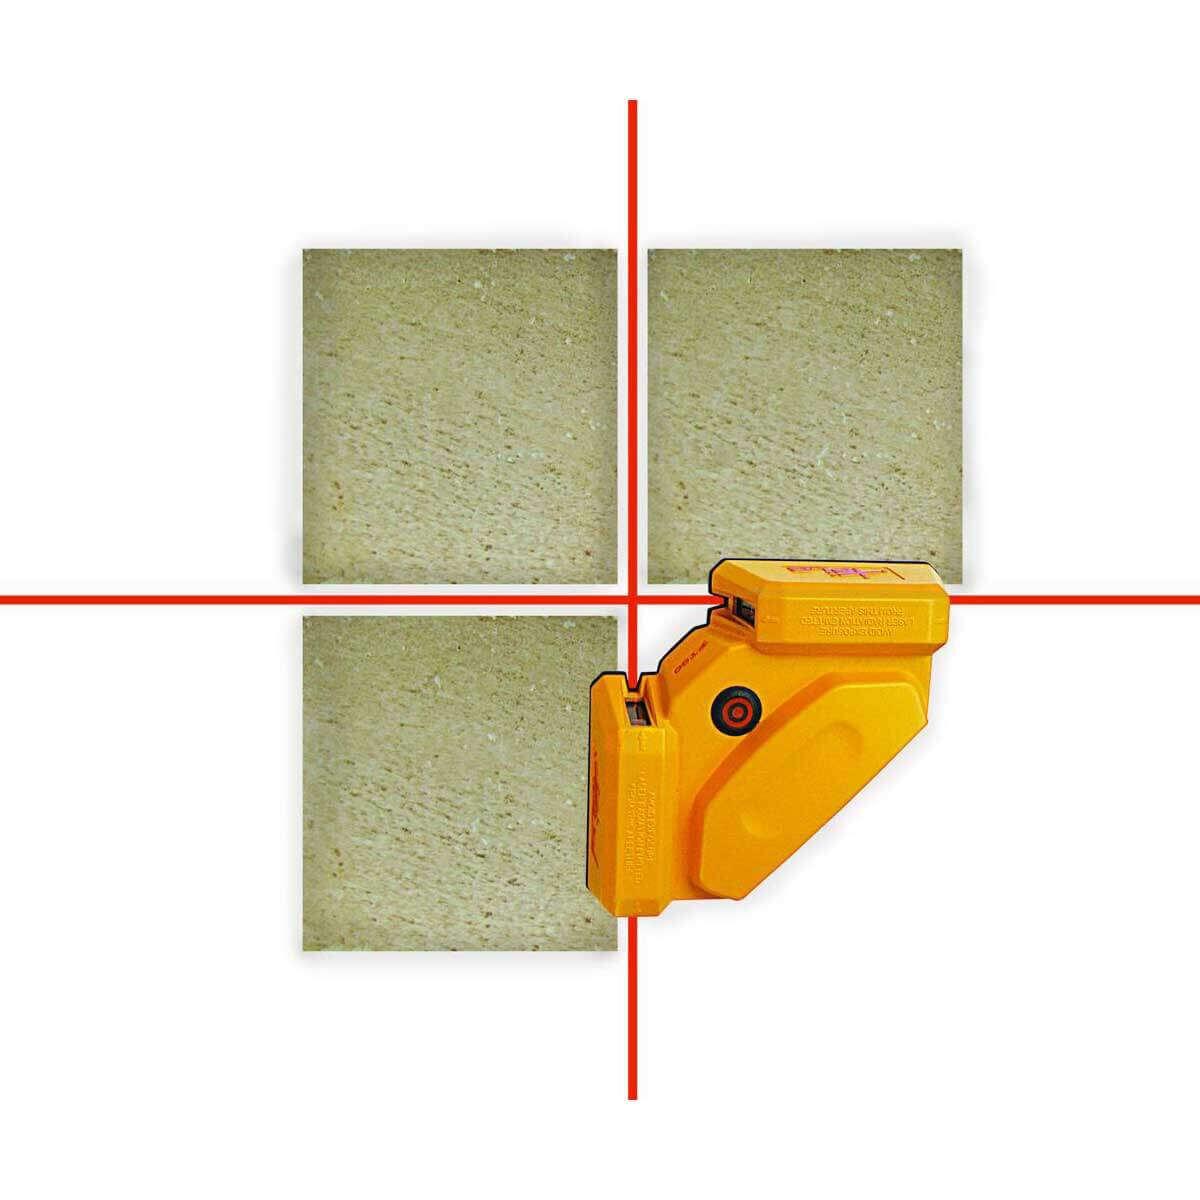 PLS FT 90 Floor Tile Layout Tool